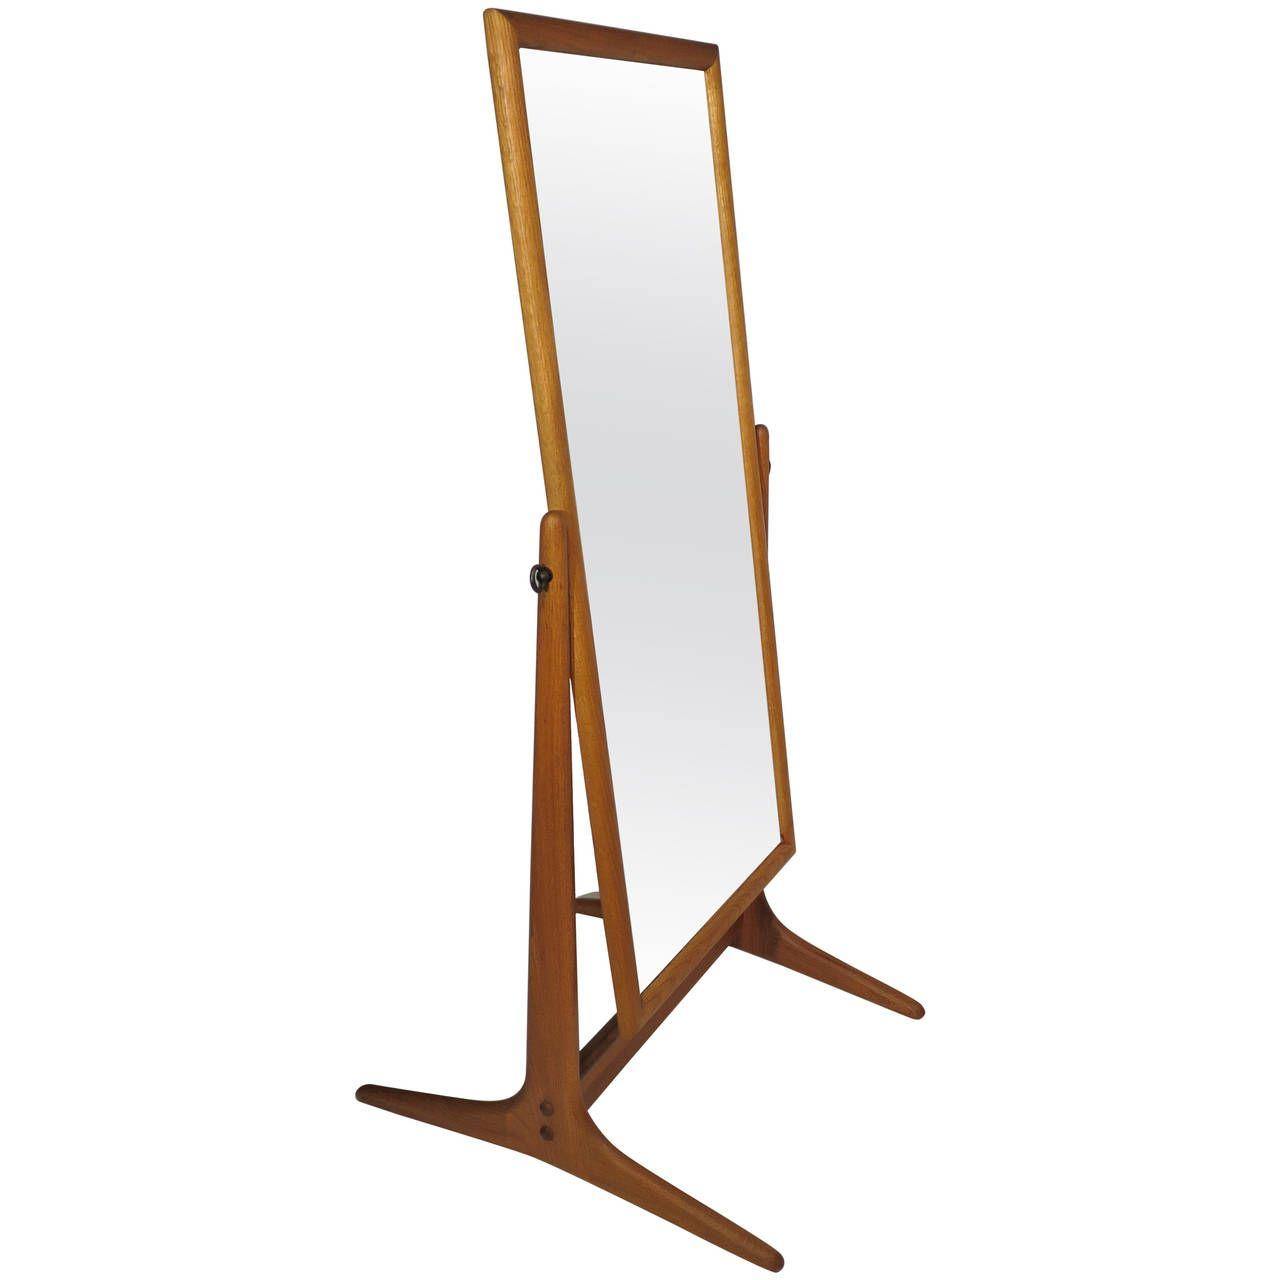 Mid-Century Cheval Floor Mirror | Modern floor mirrors, Mirror floor ...